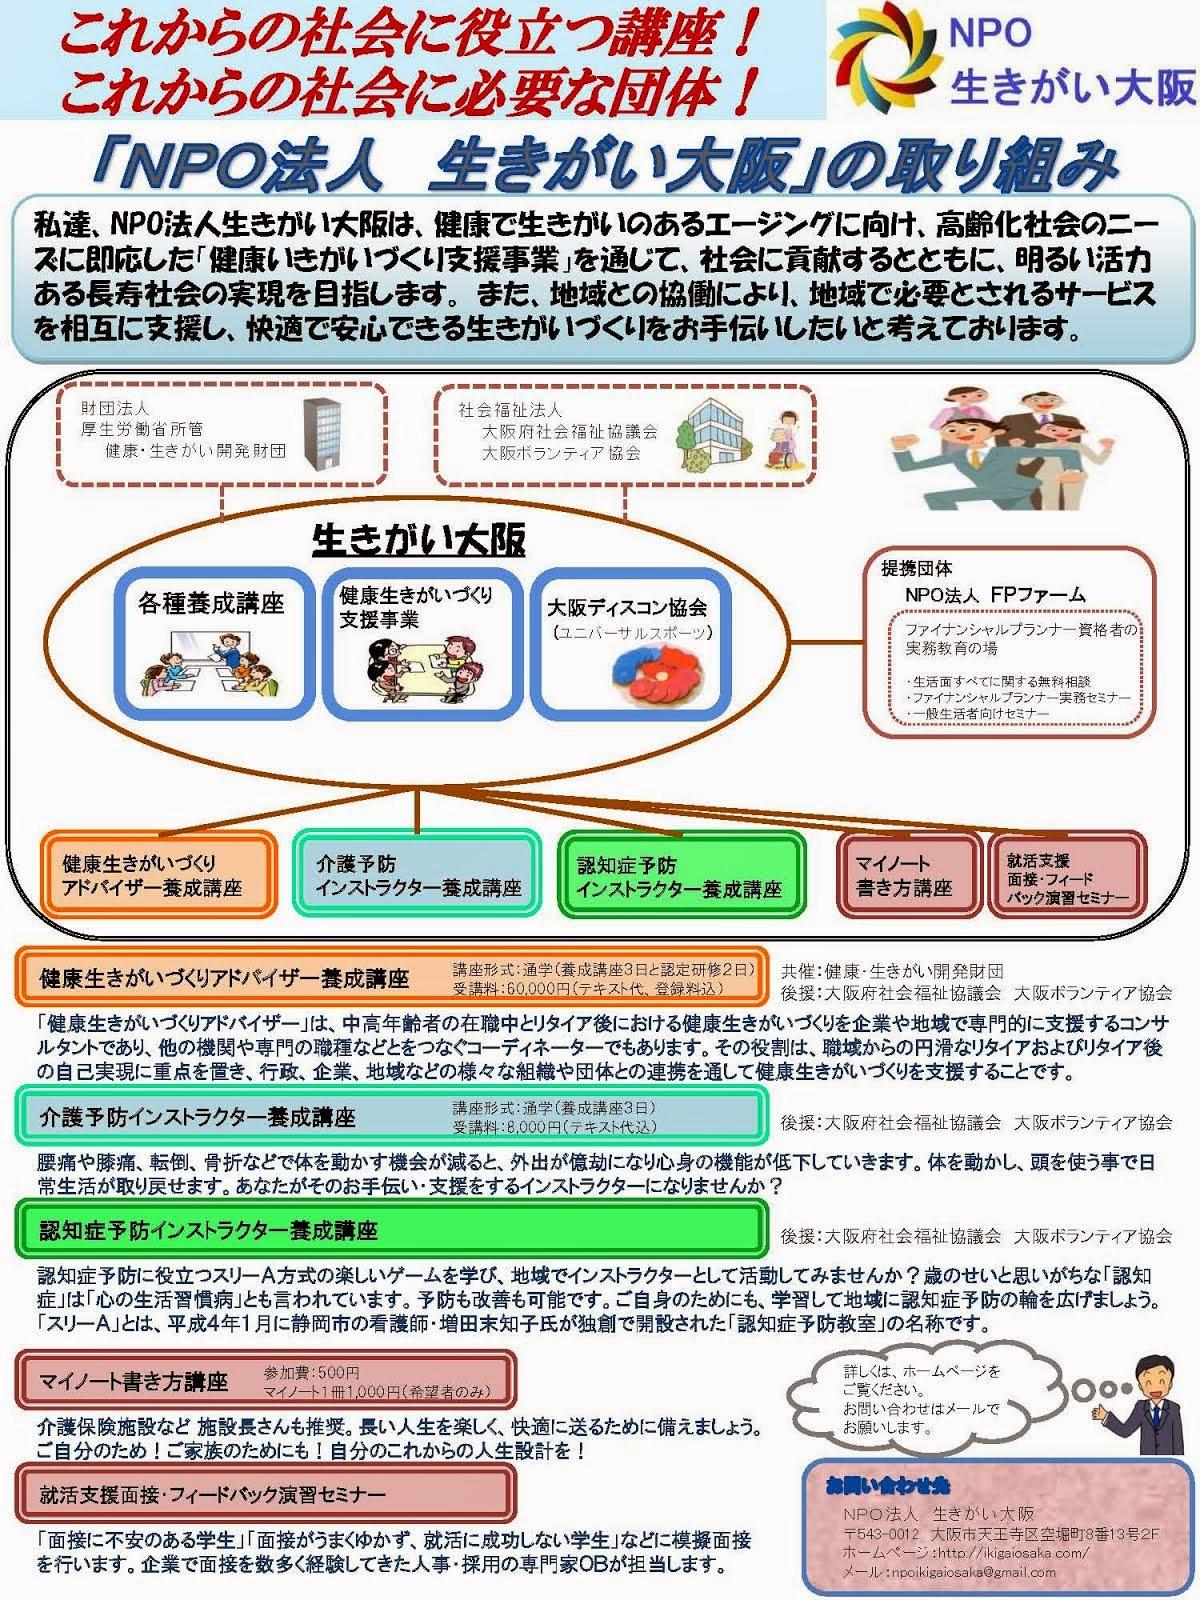 NPO生きがい大阪の活動内容